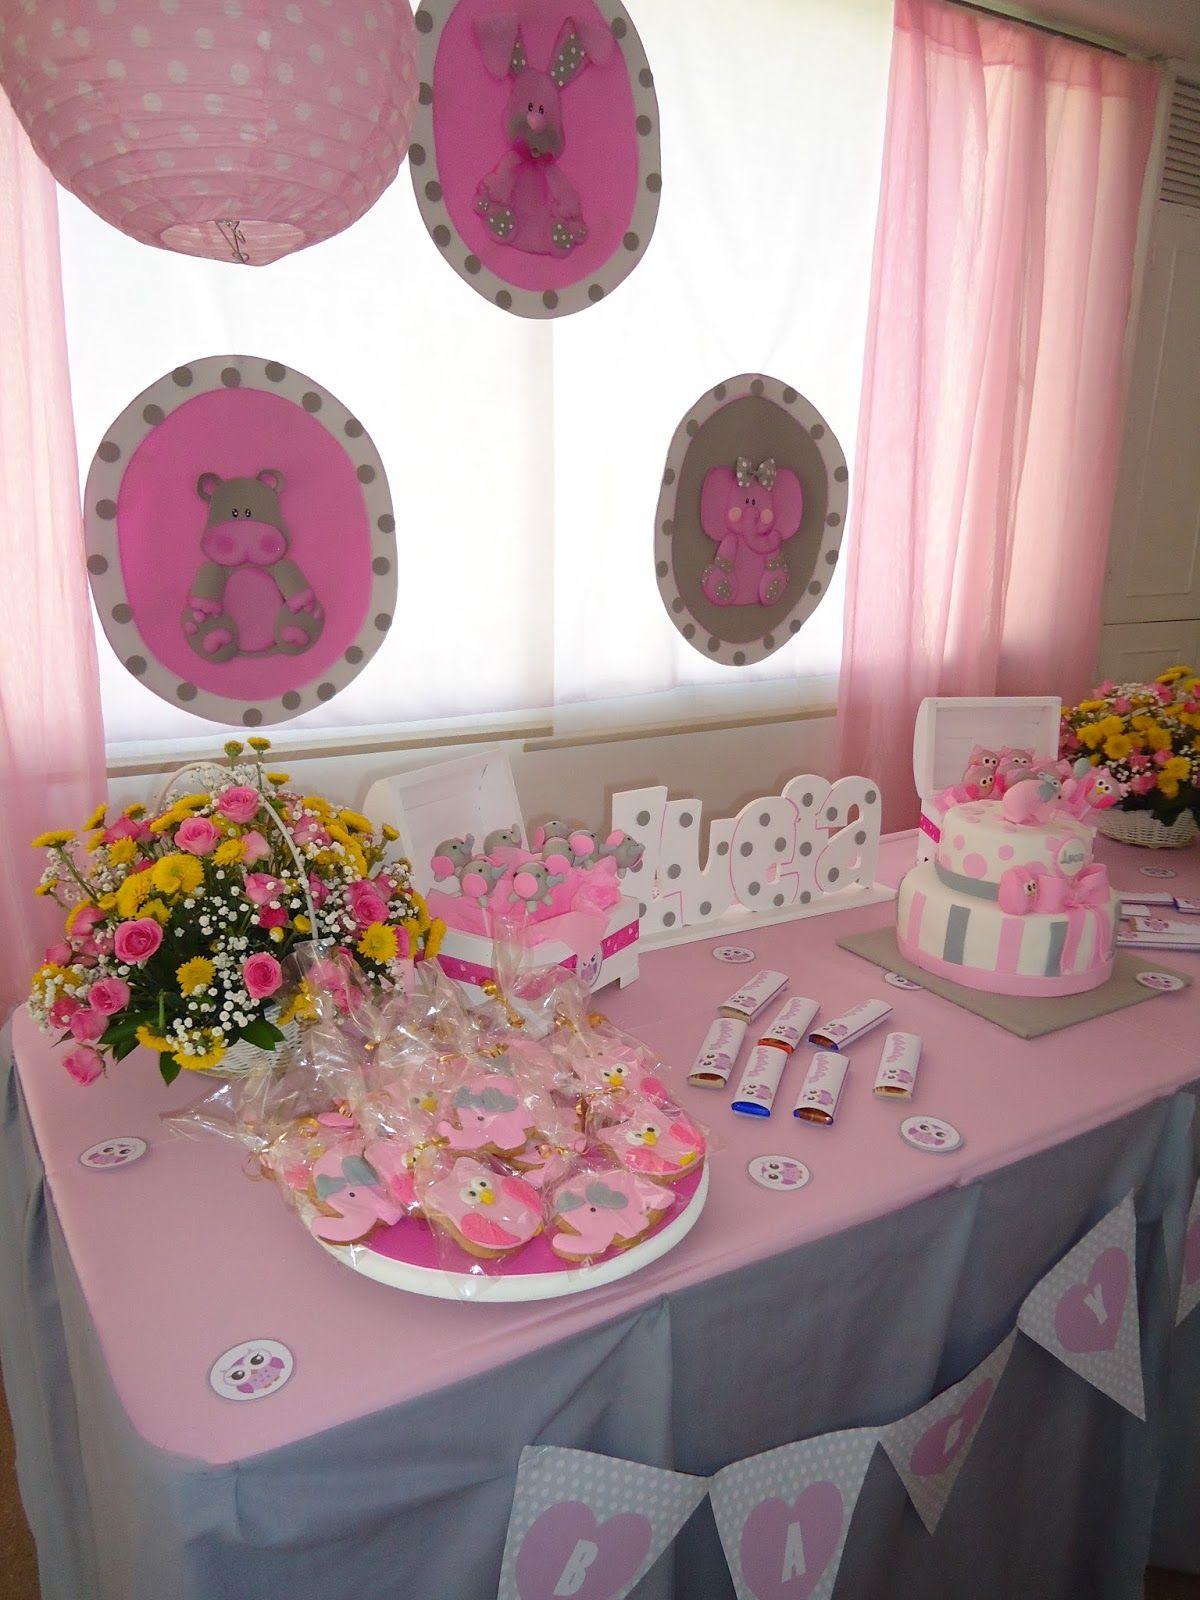 Beula decoraciones decoracion de eventos tematicos e for Decoracion infantil nina